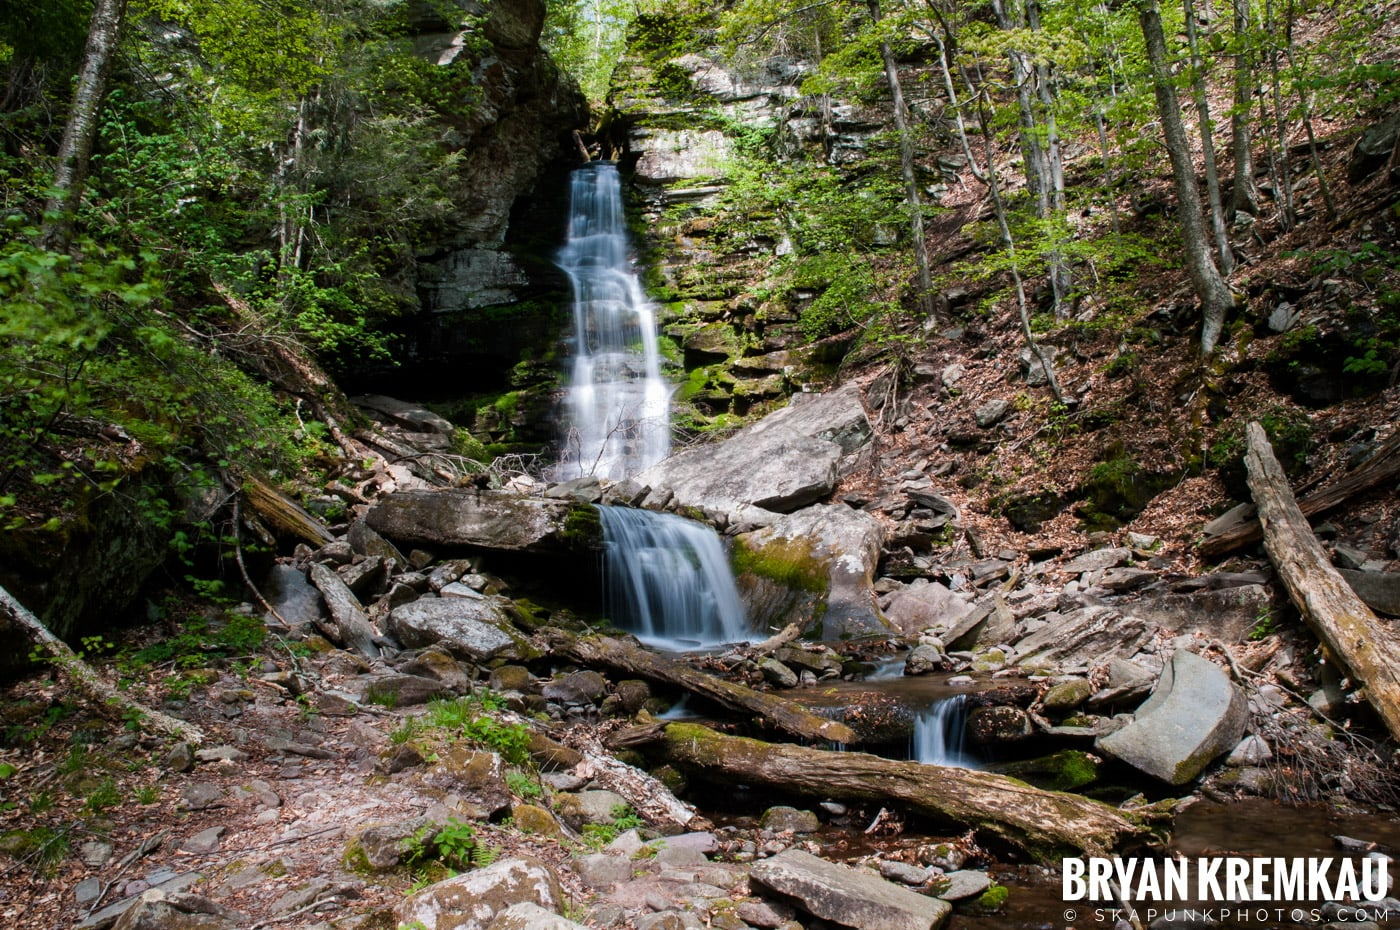 Getting Engaged @ Peekamoose Waterfall, Sundown NY - 5.1.10 (28)